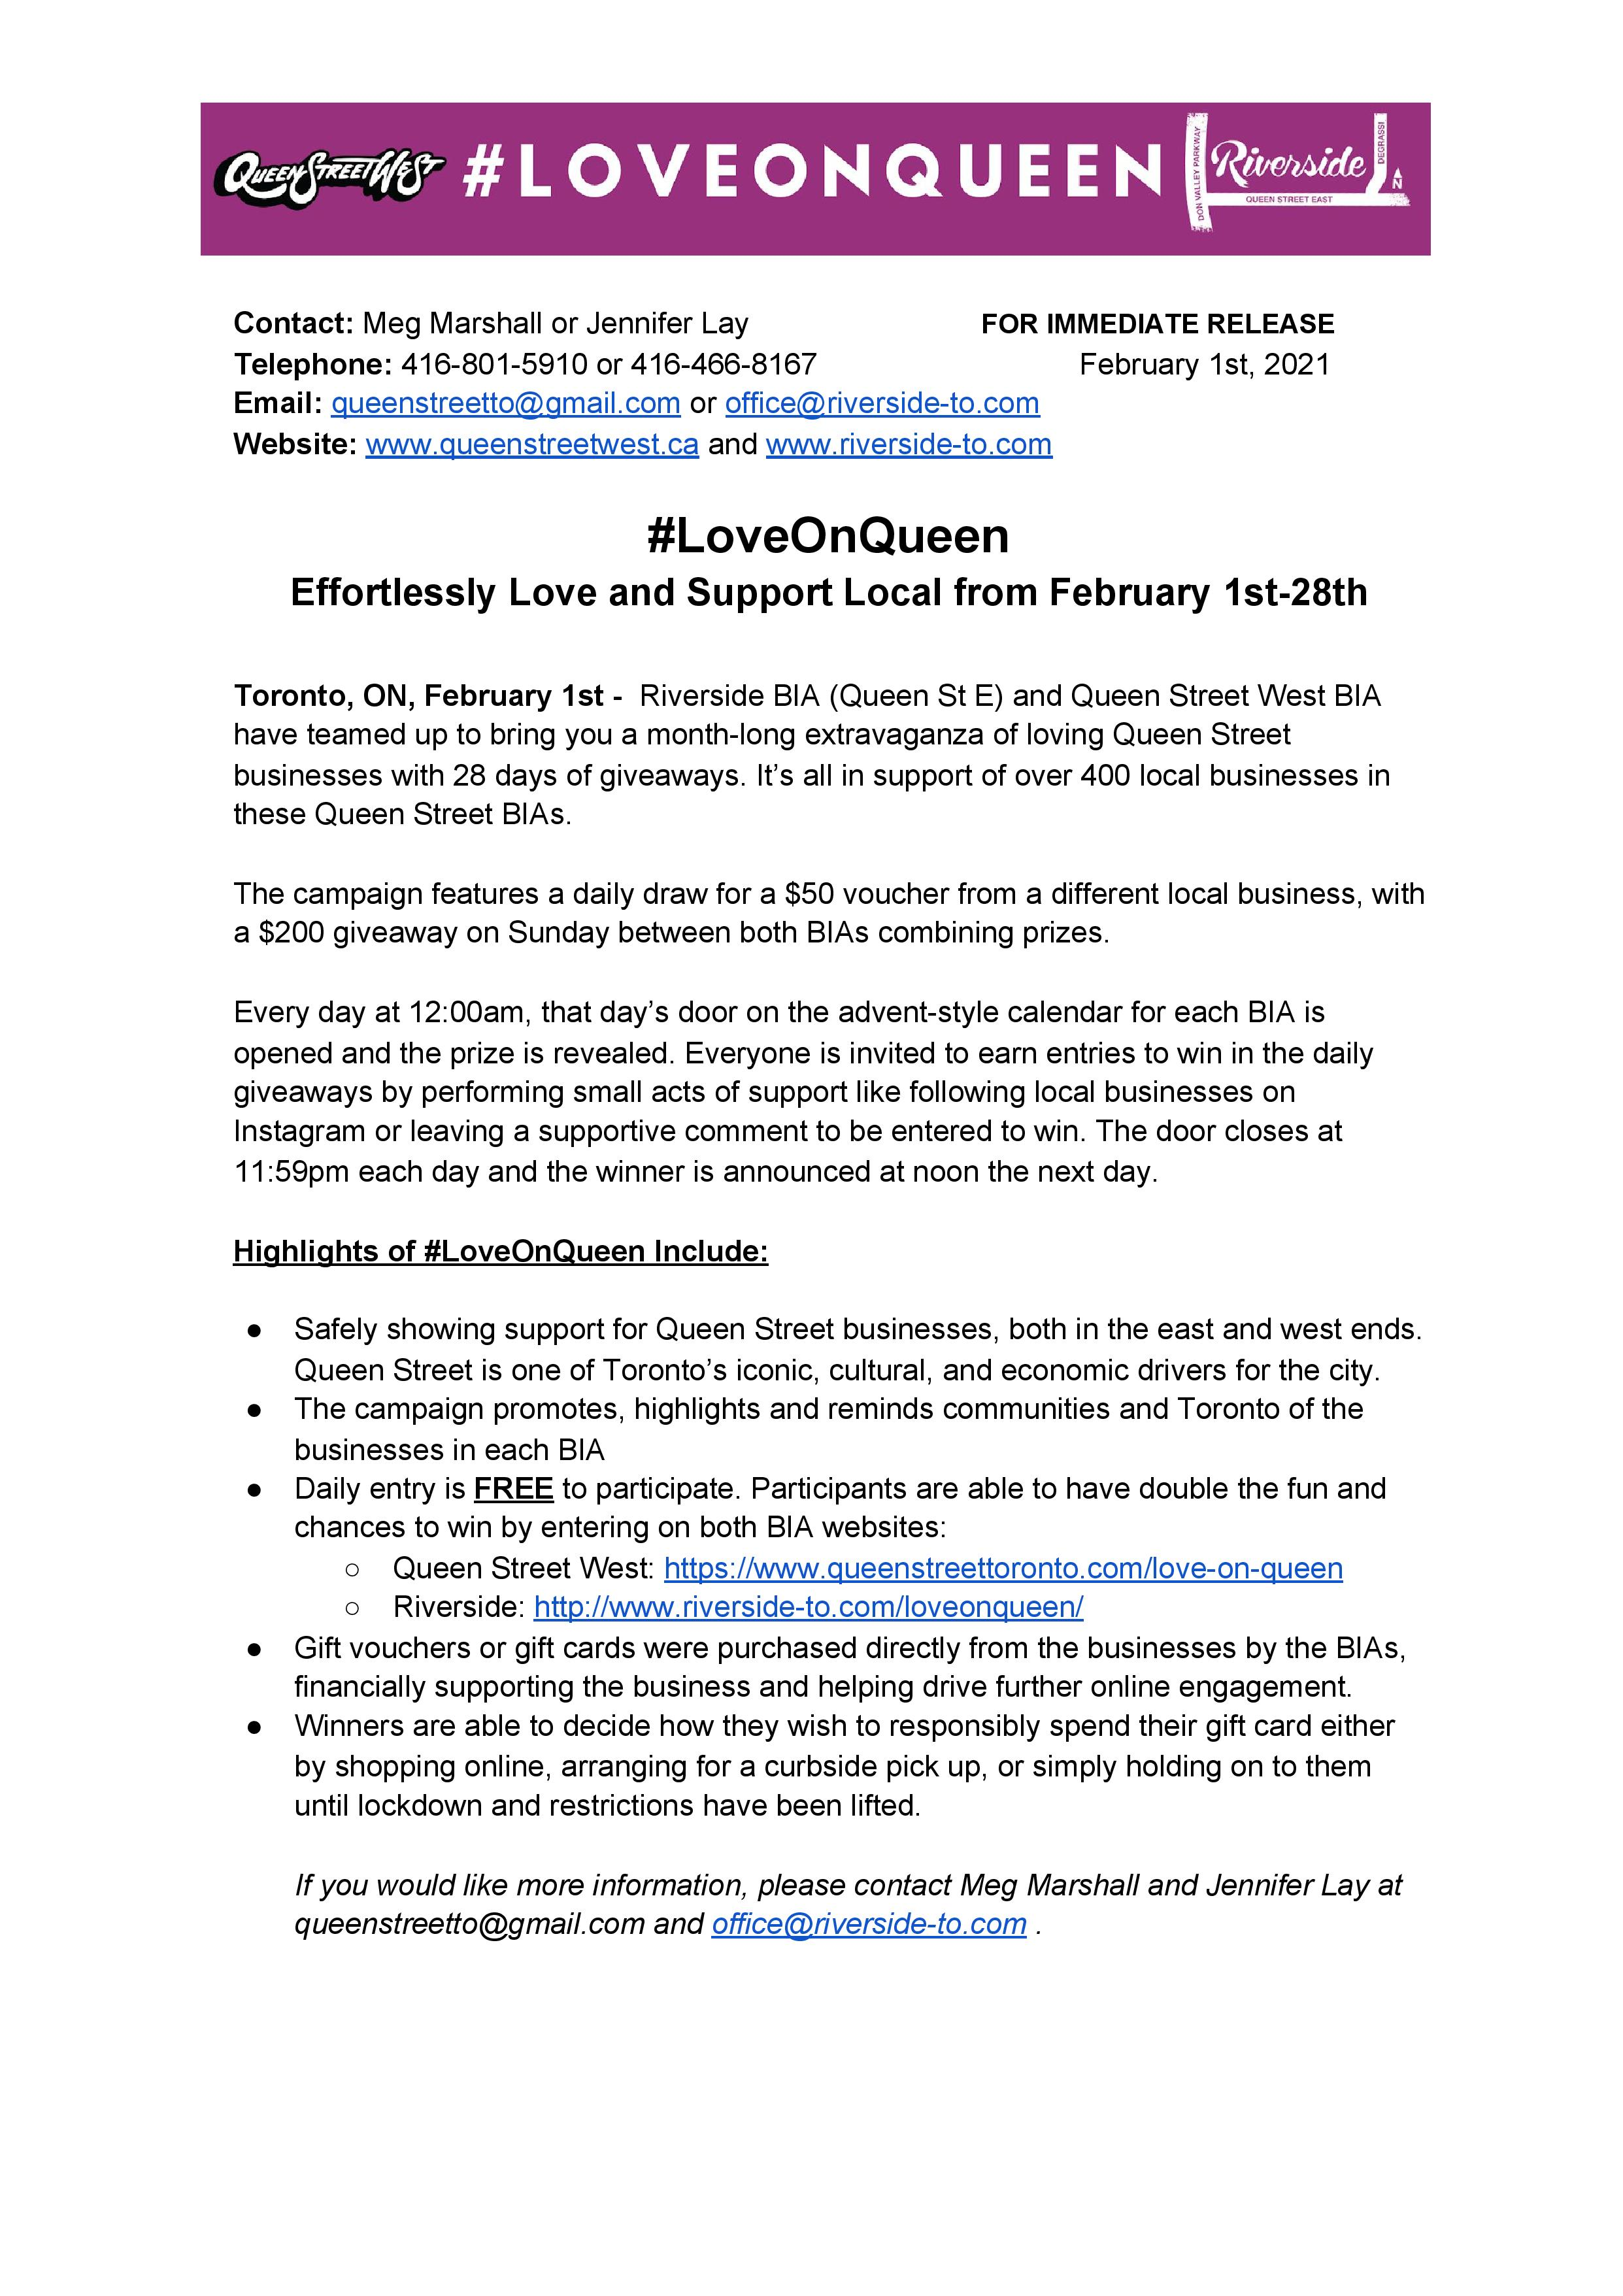 #LOVEONQUEEN Press Release